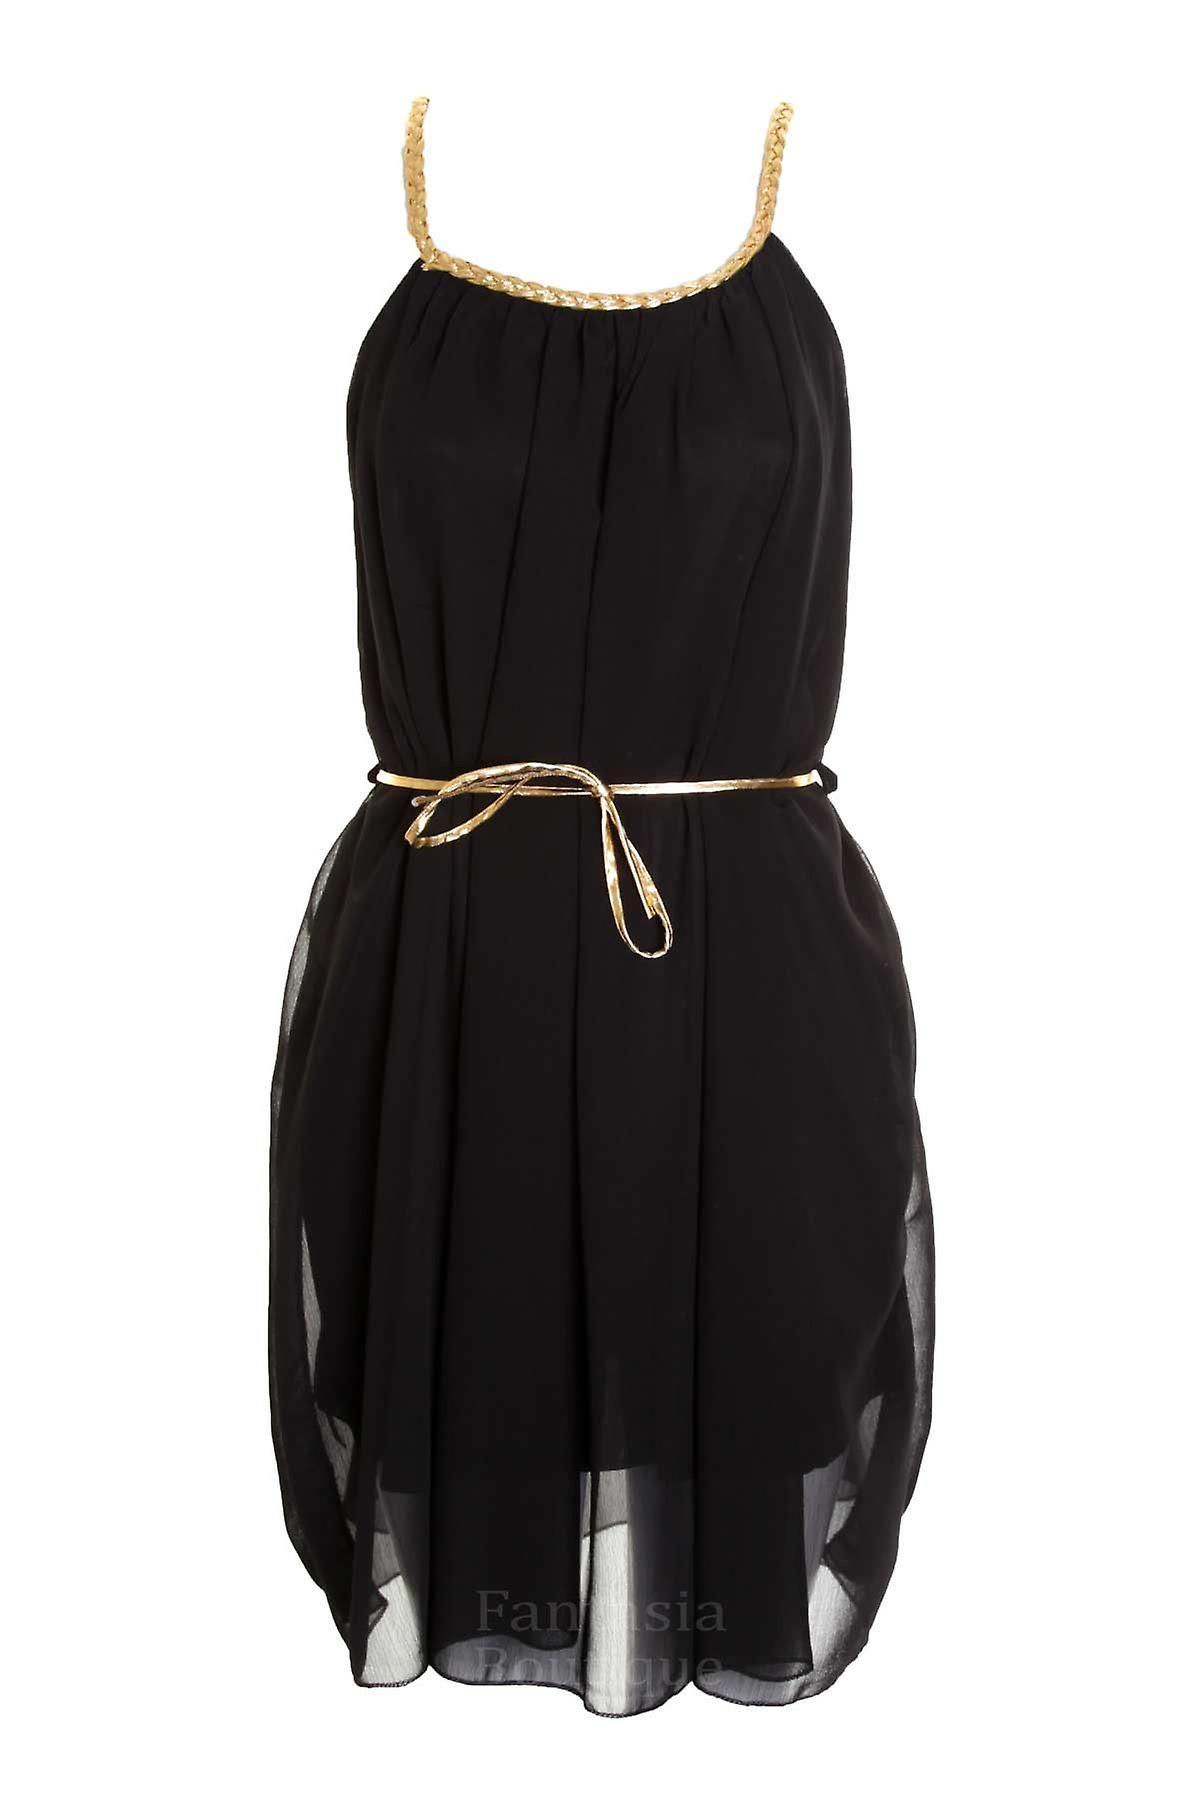 Ladies Gold Strap Plain Black Gold Bow Belt Evening Womens Dress